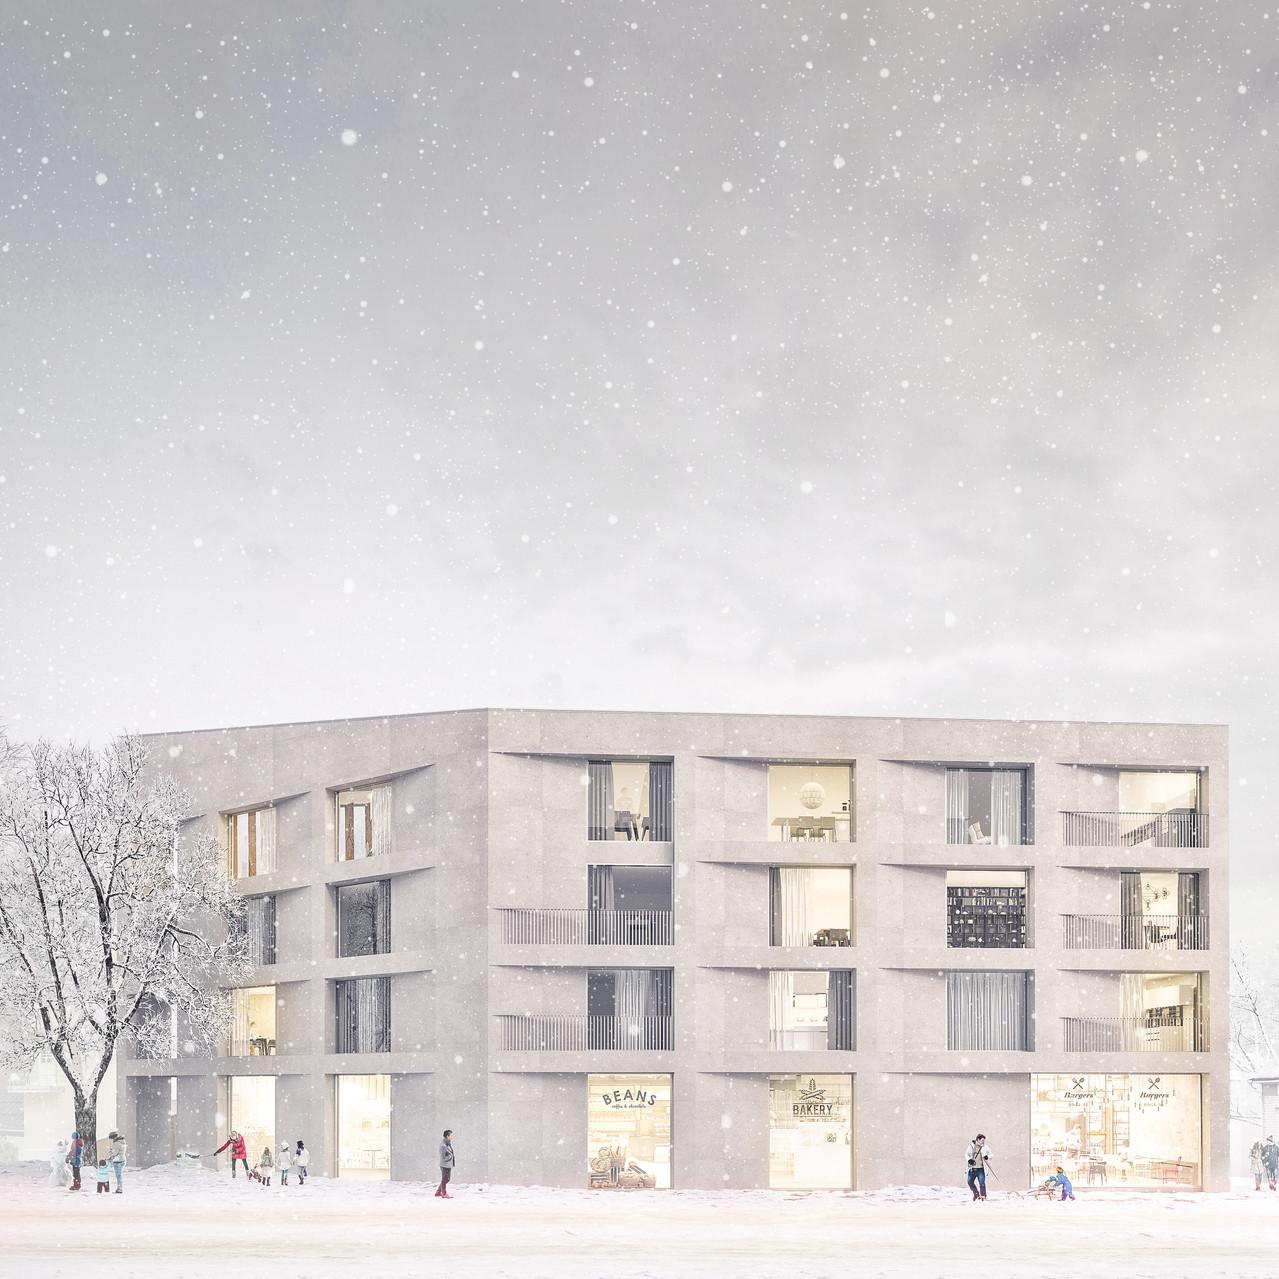 Housing in Lappeenranta